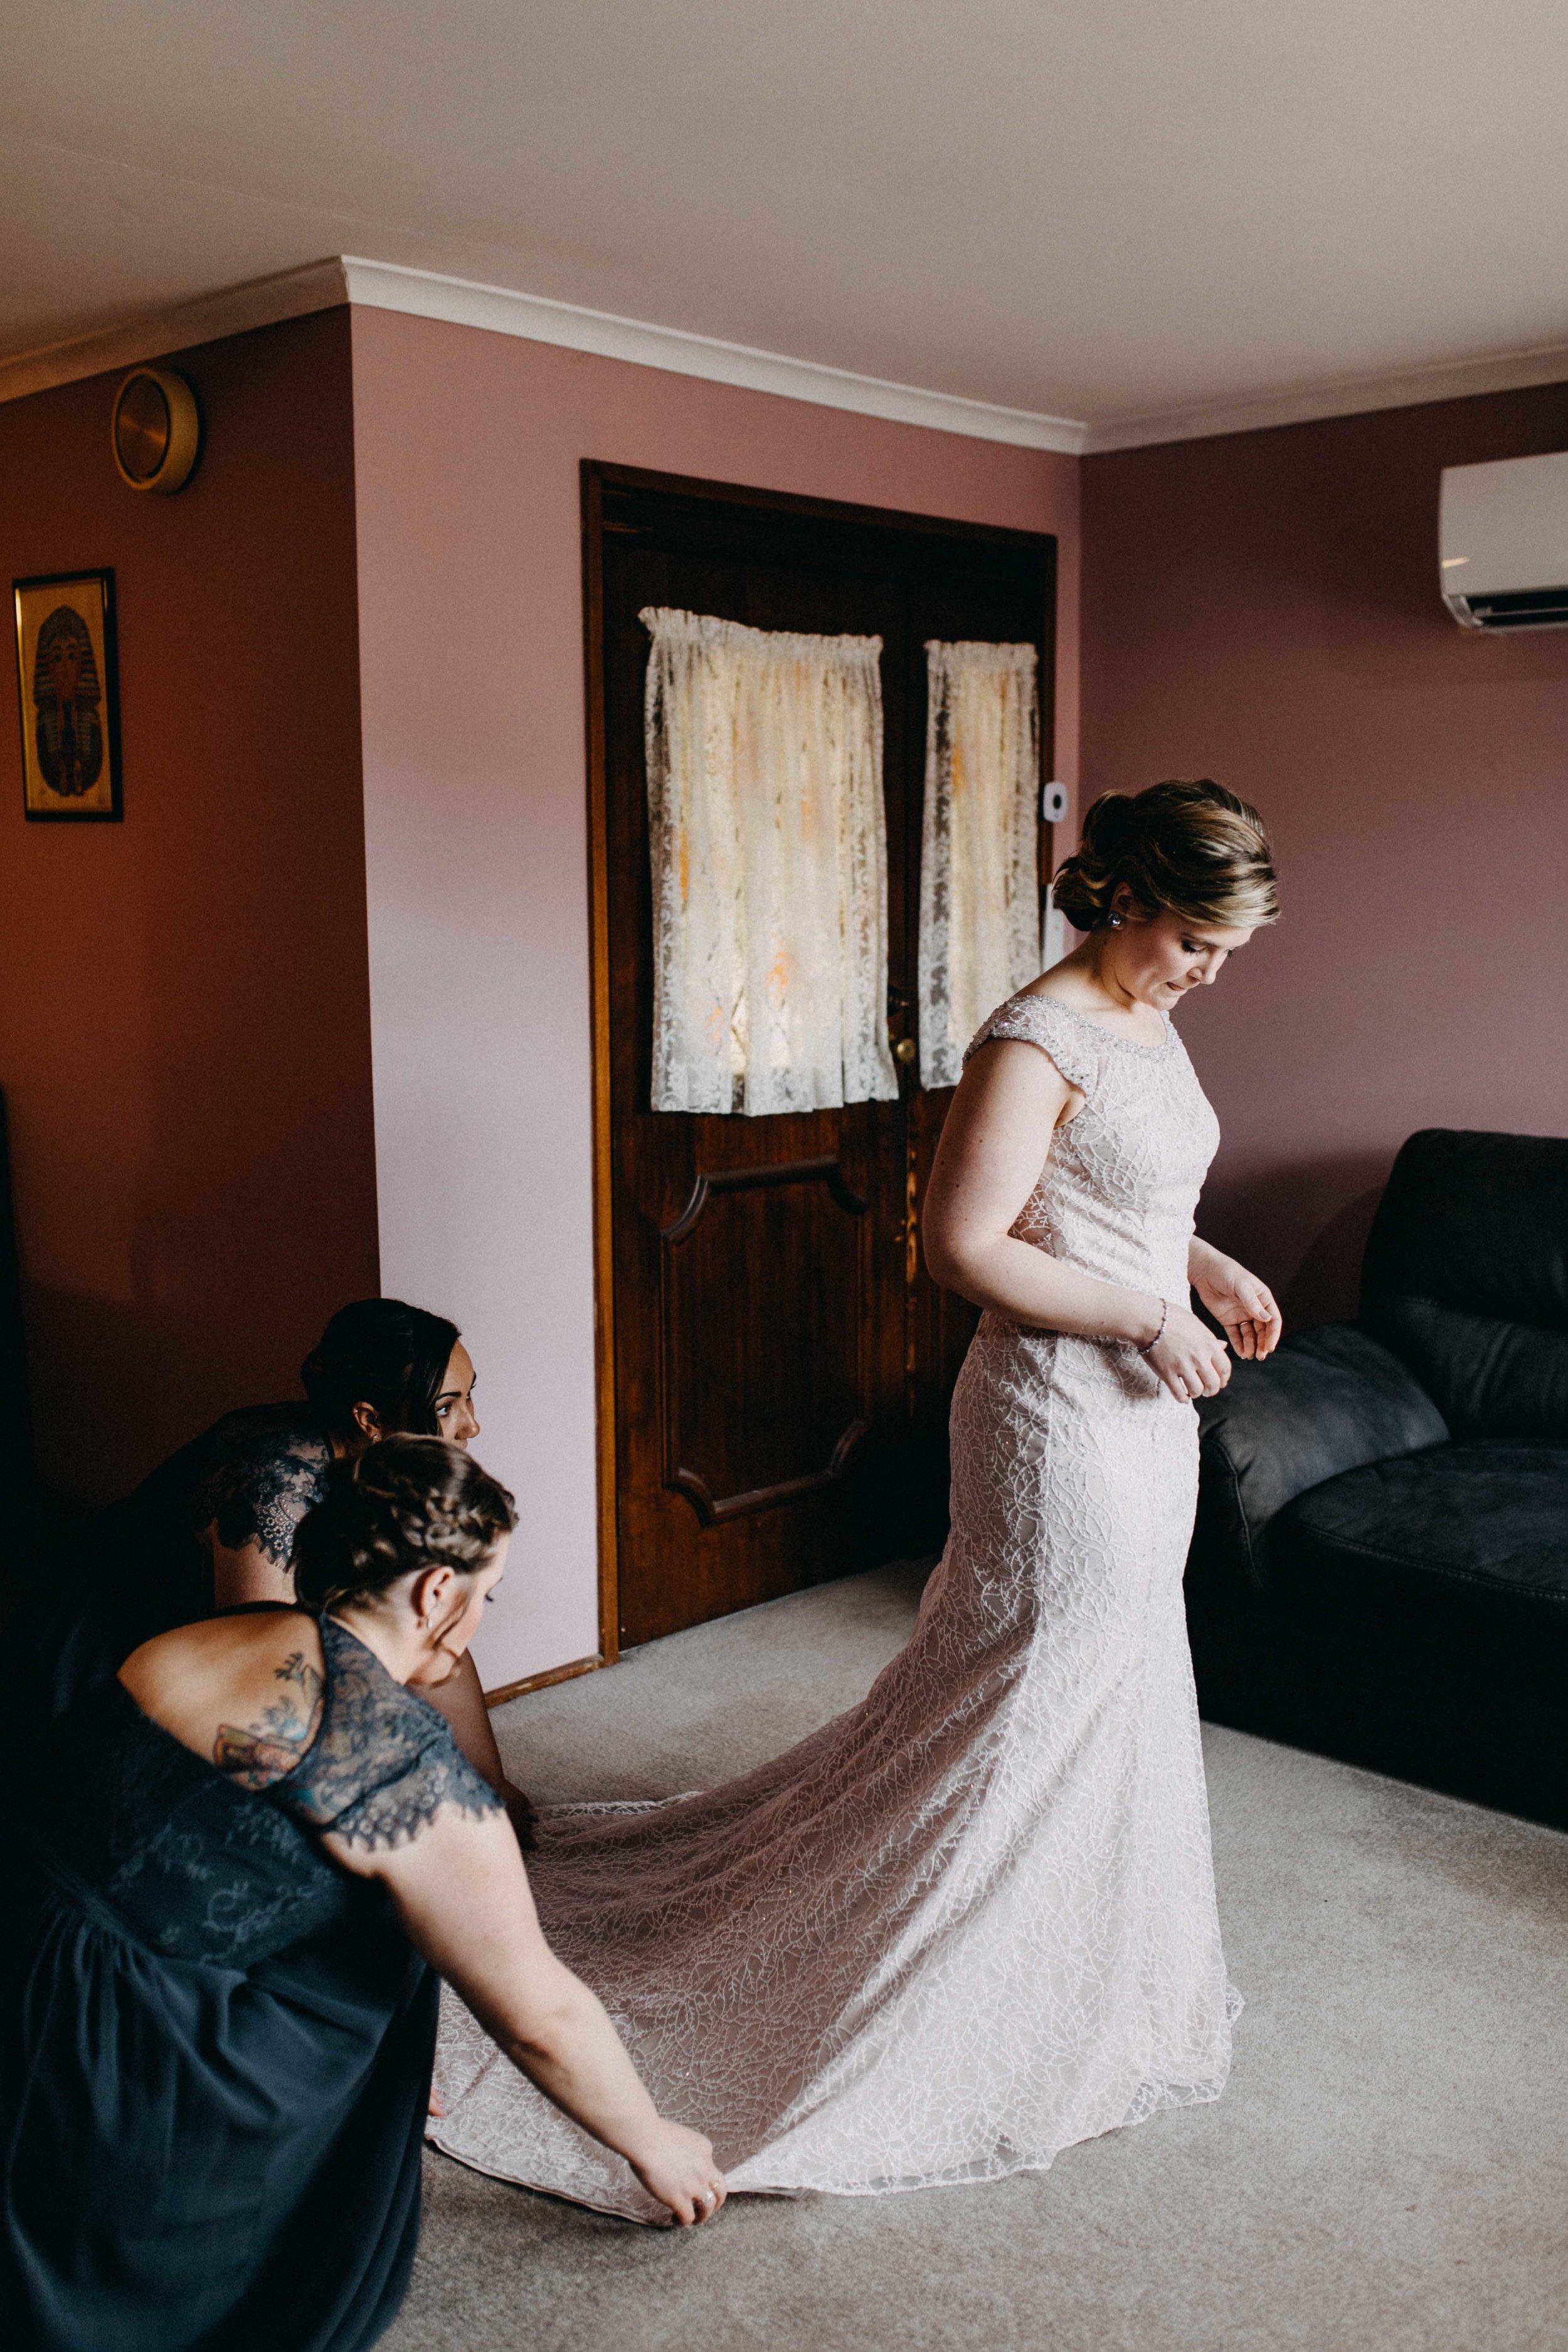 appin-house-wedding-macarthur-www.emilyobrienphotography.net-26.jpg